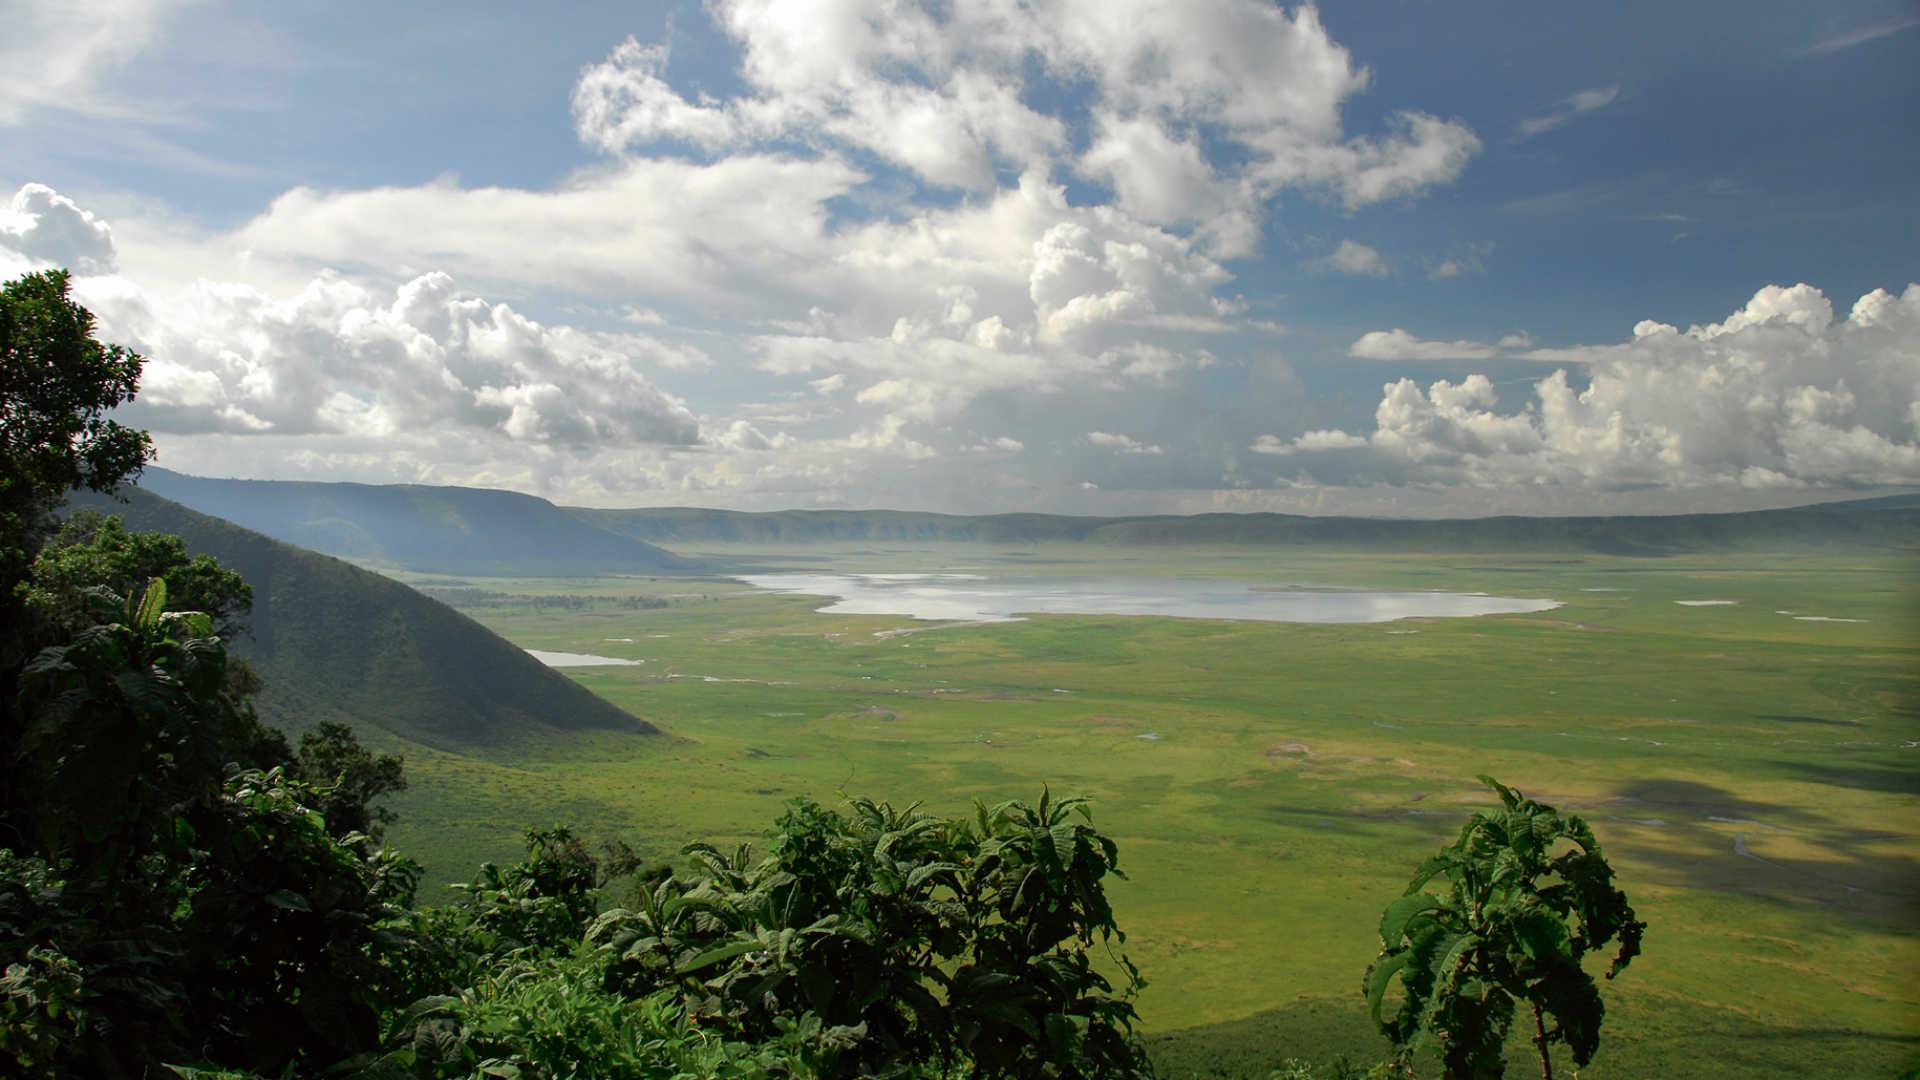 Africa, Tanzania, Crater Ngorongoro, safari